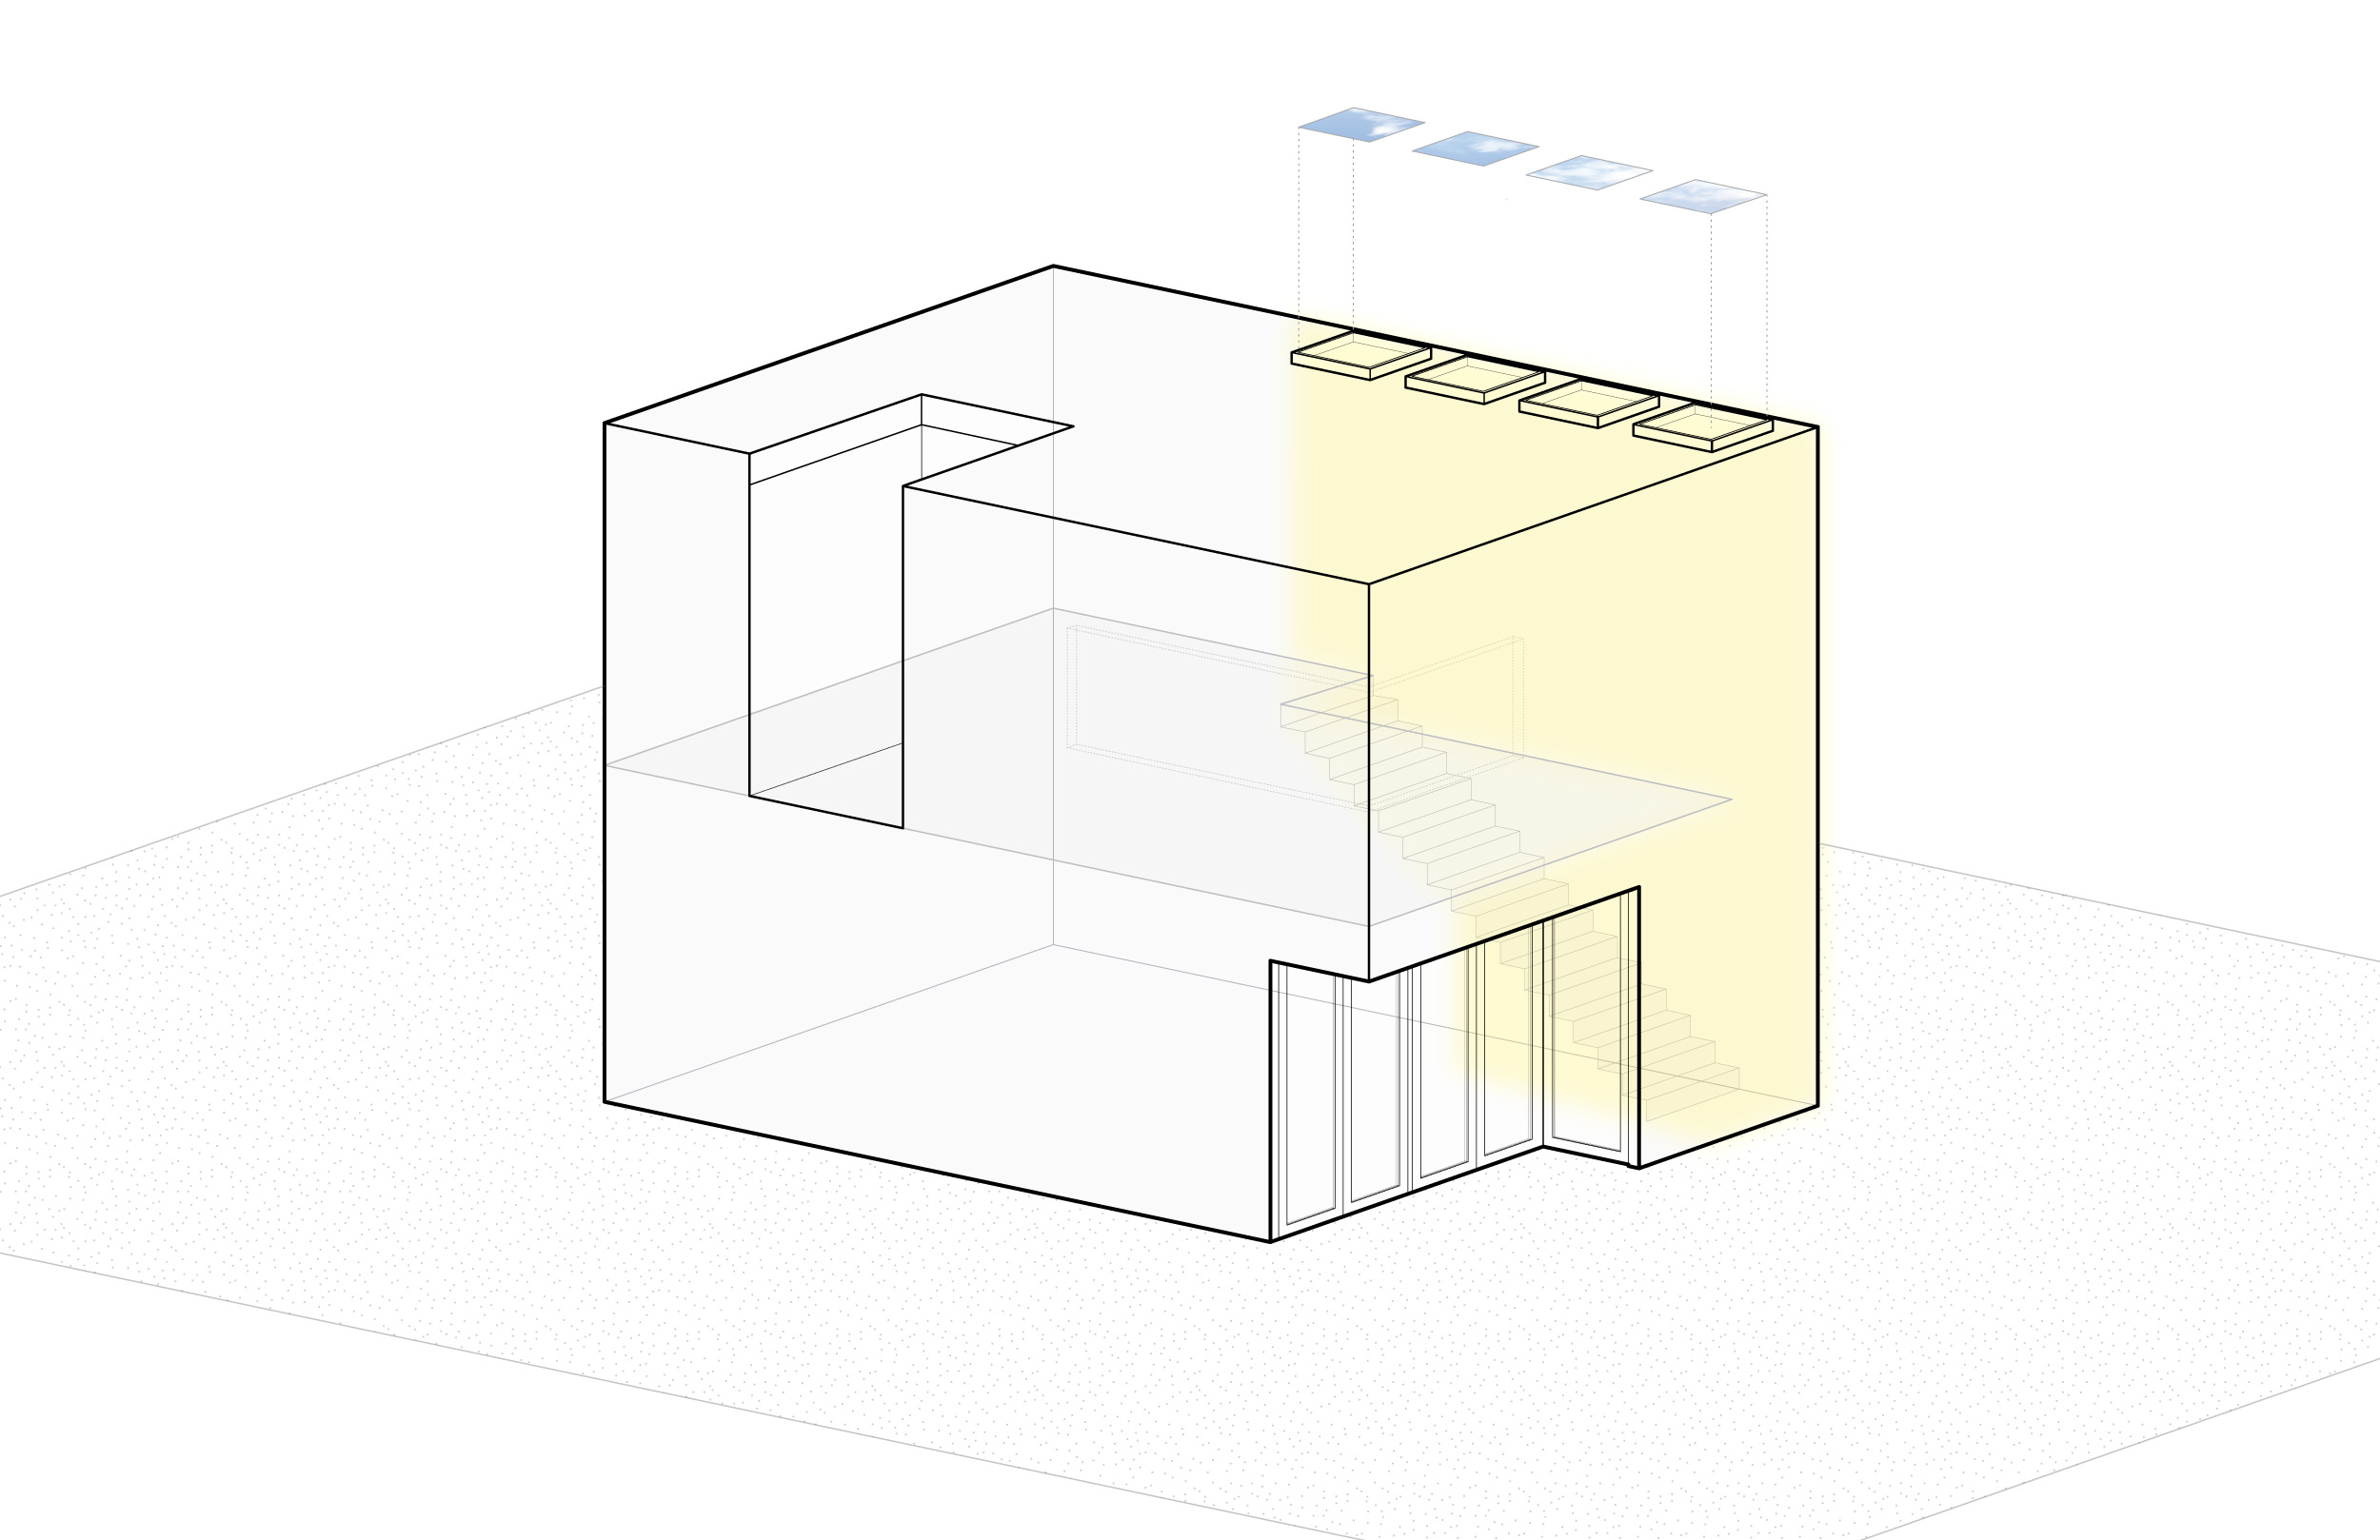 Studio-City-House_Diagram_04.jpg